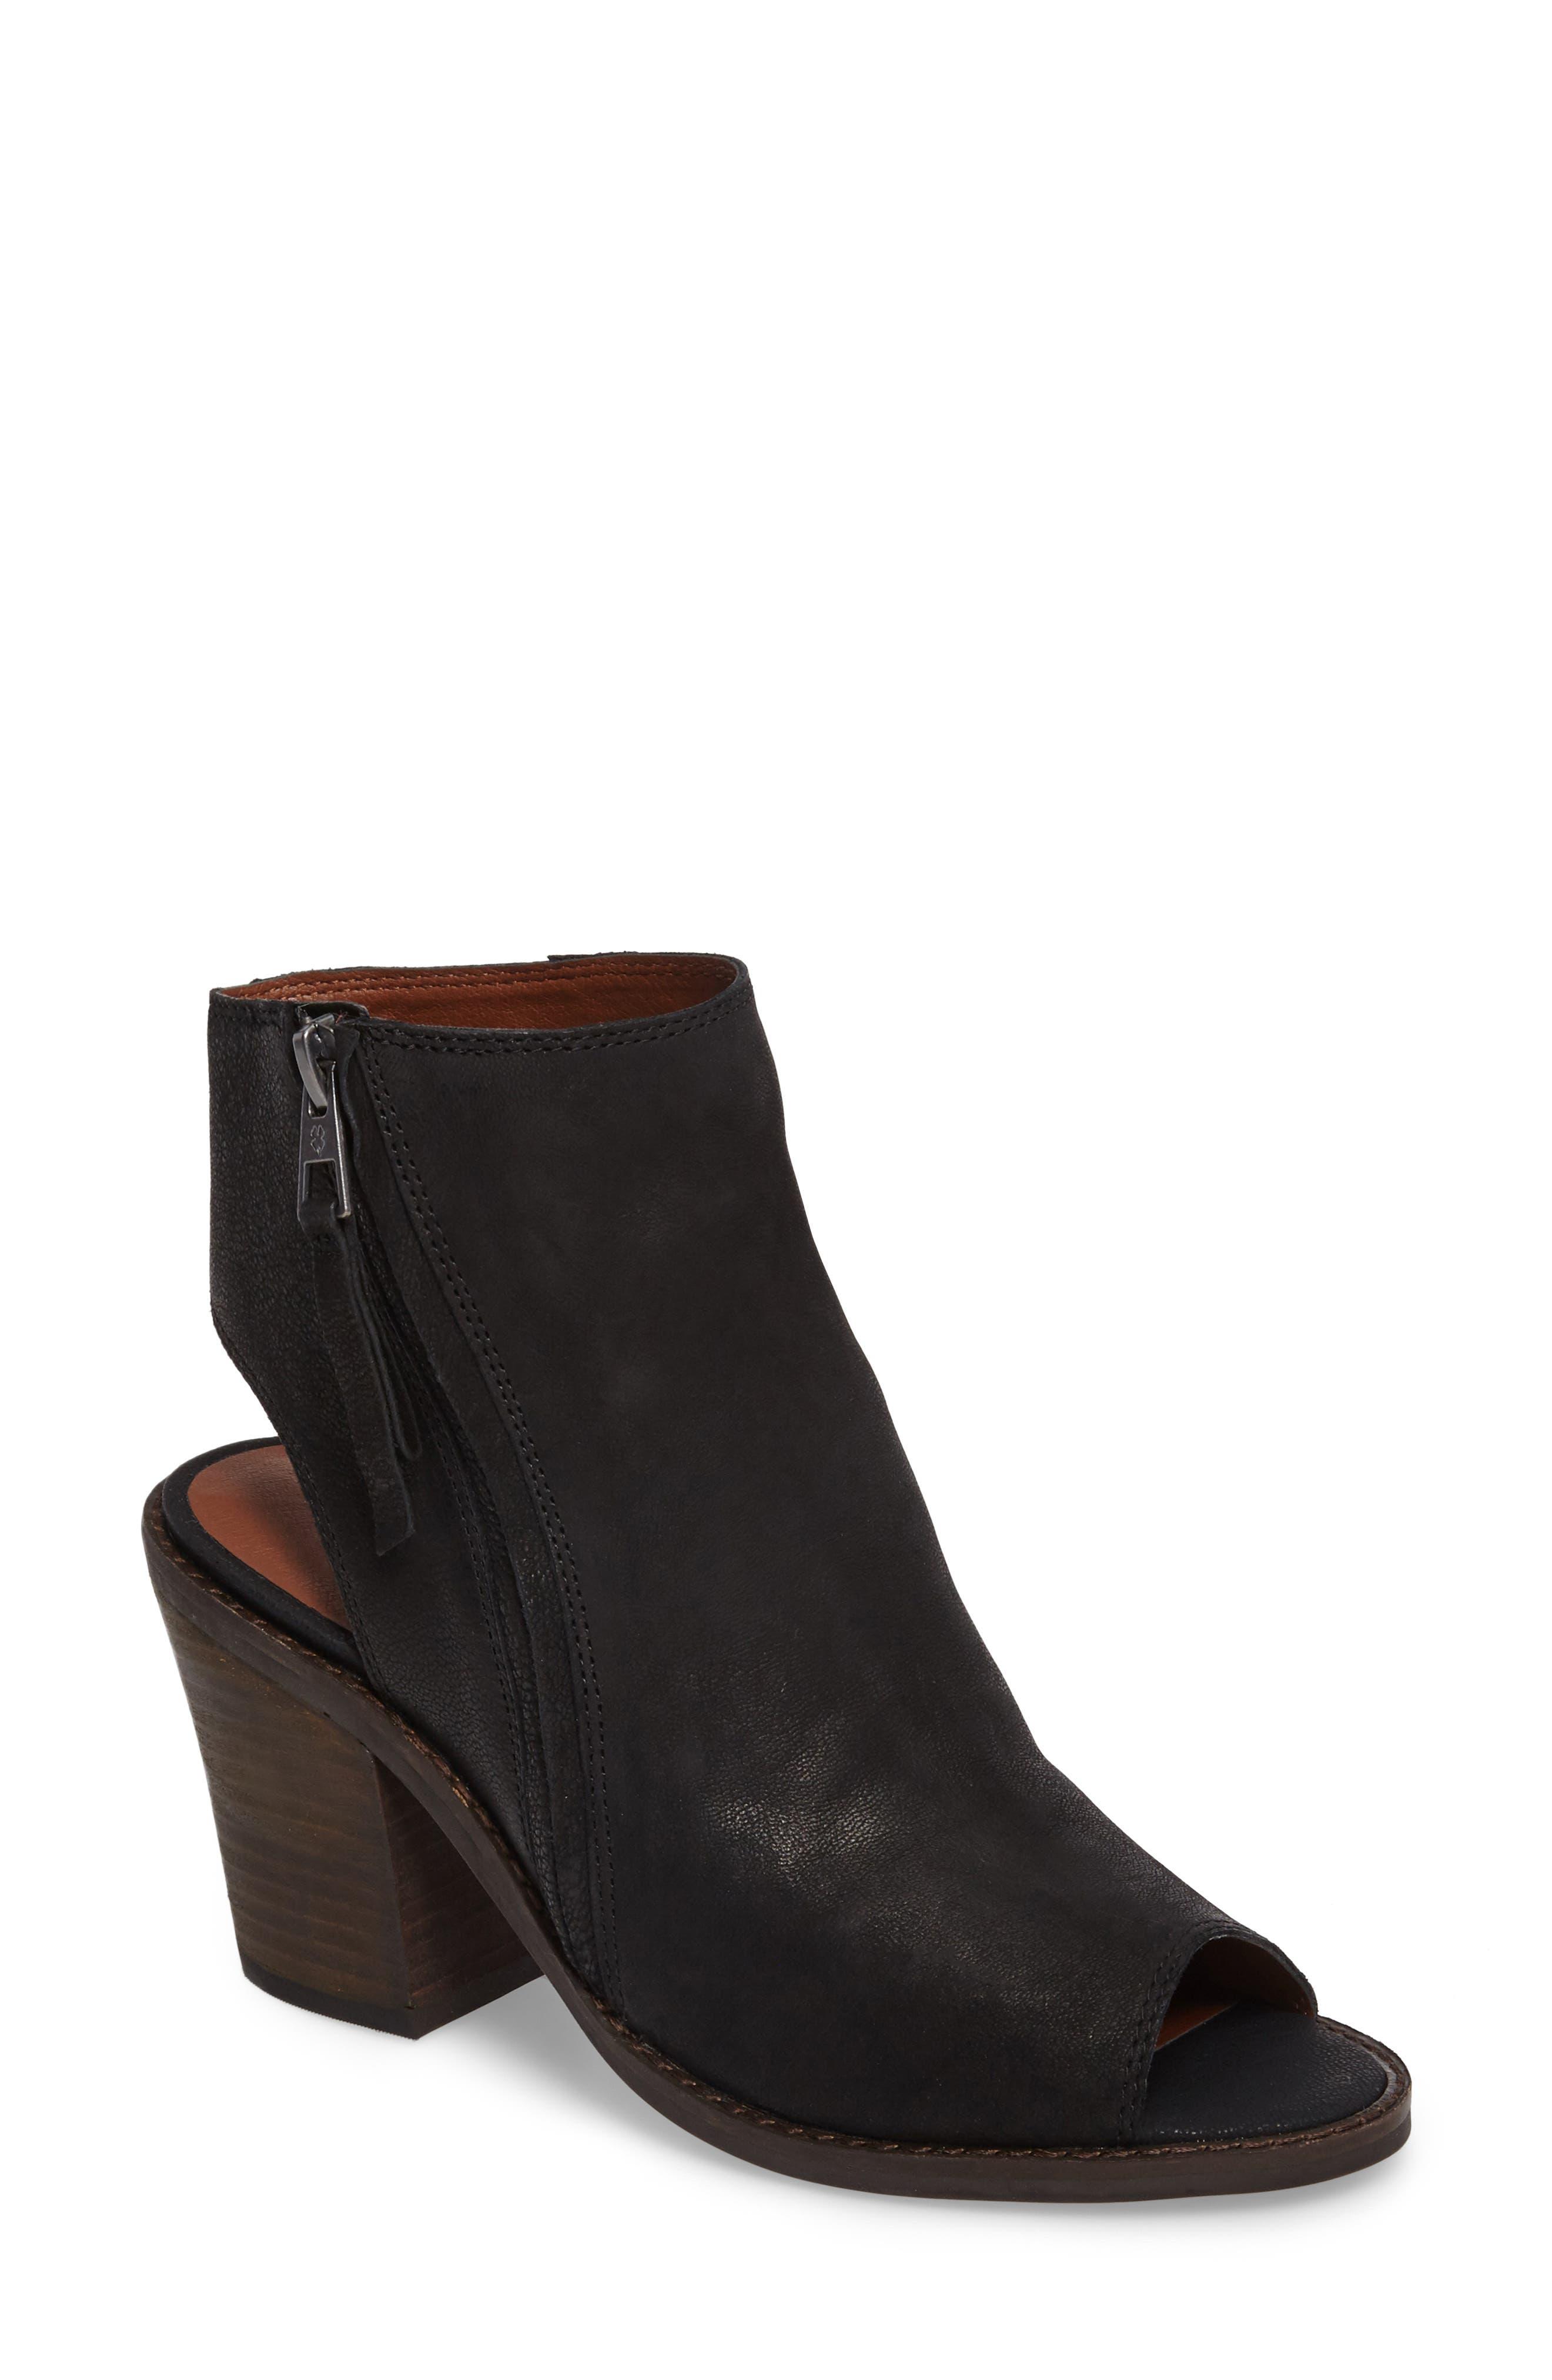 Terrie Peep Toe Bootie,                         Main,                         color, Black Leather